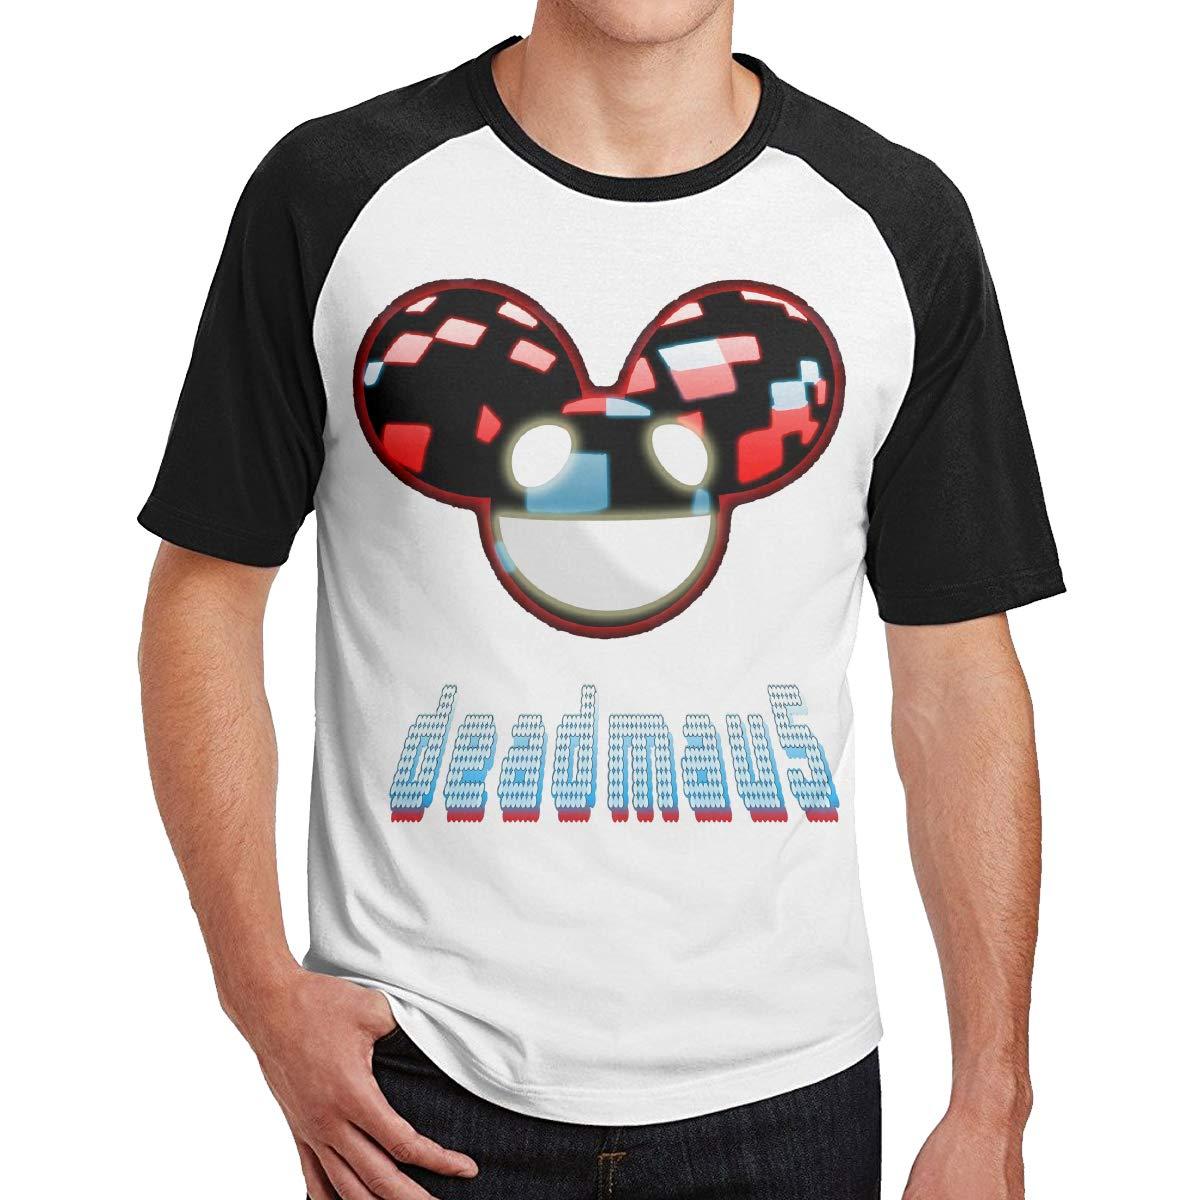 Deadmau5 Logo Music Band Singer Short Sleeve Soft Baseball T-Shirts